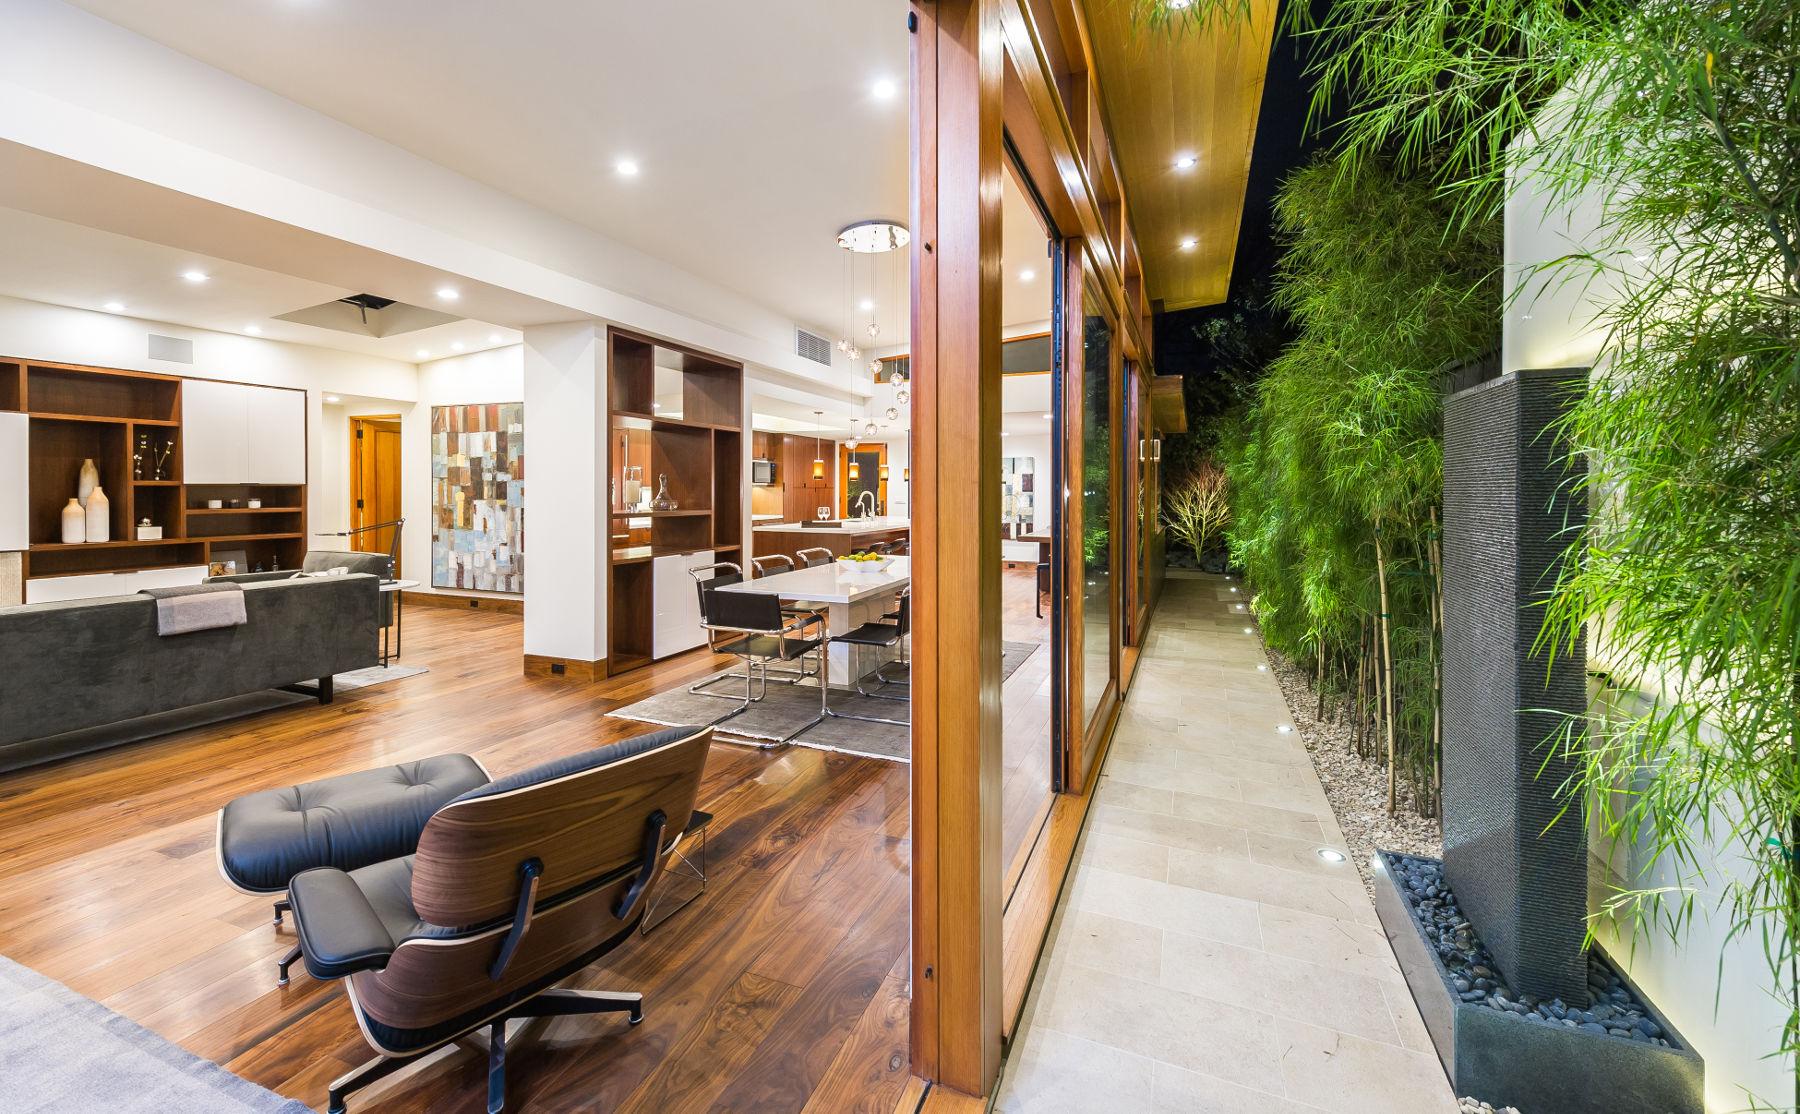 Westgate Residence: Mid-Century Modern Whole House Renovation